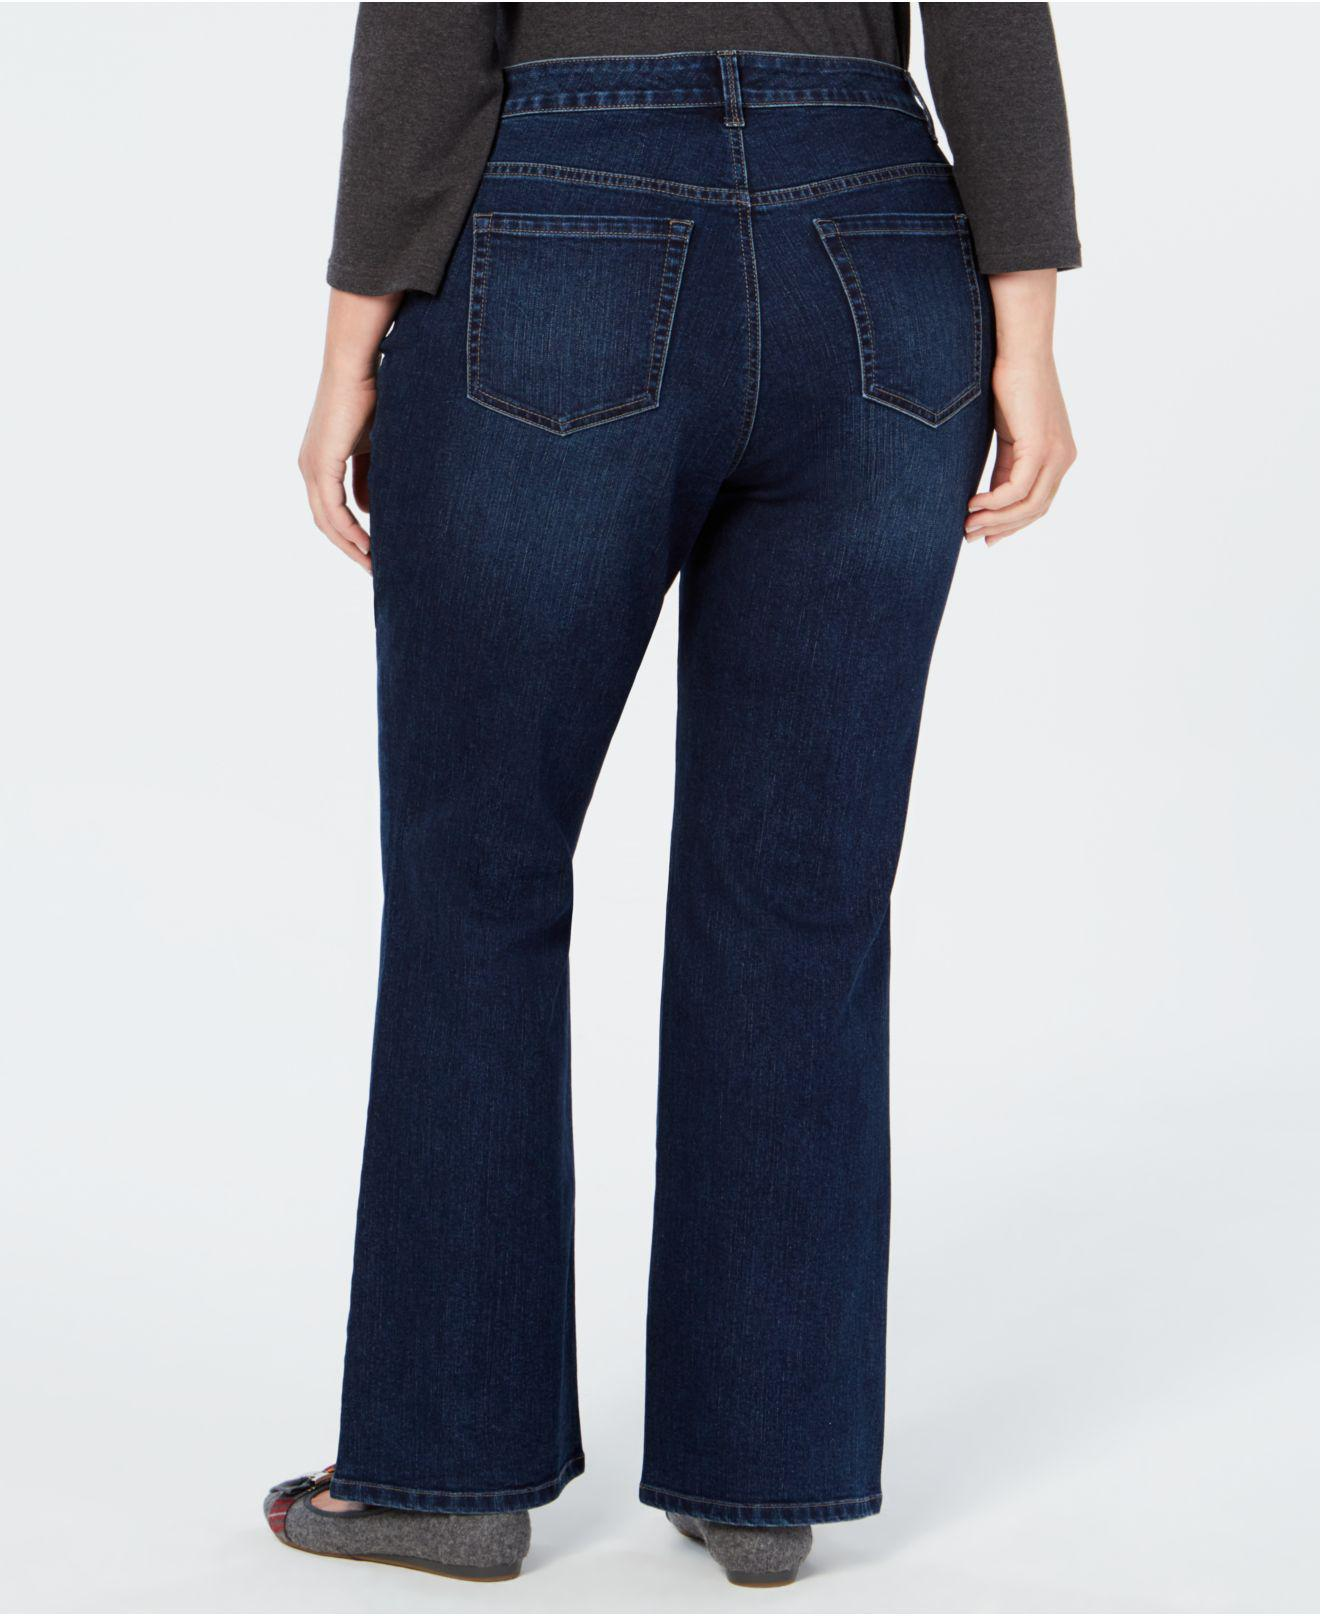 b6a75590a14 Lyst - Charter Club Plus Size Prescott Tummy-control Bootcut Jeans ...